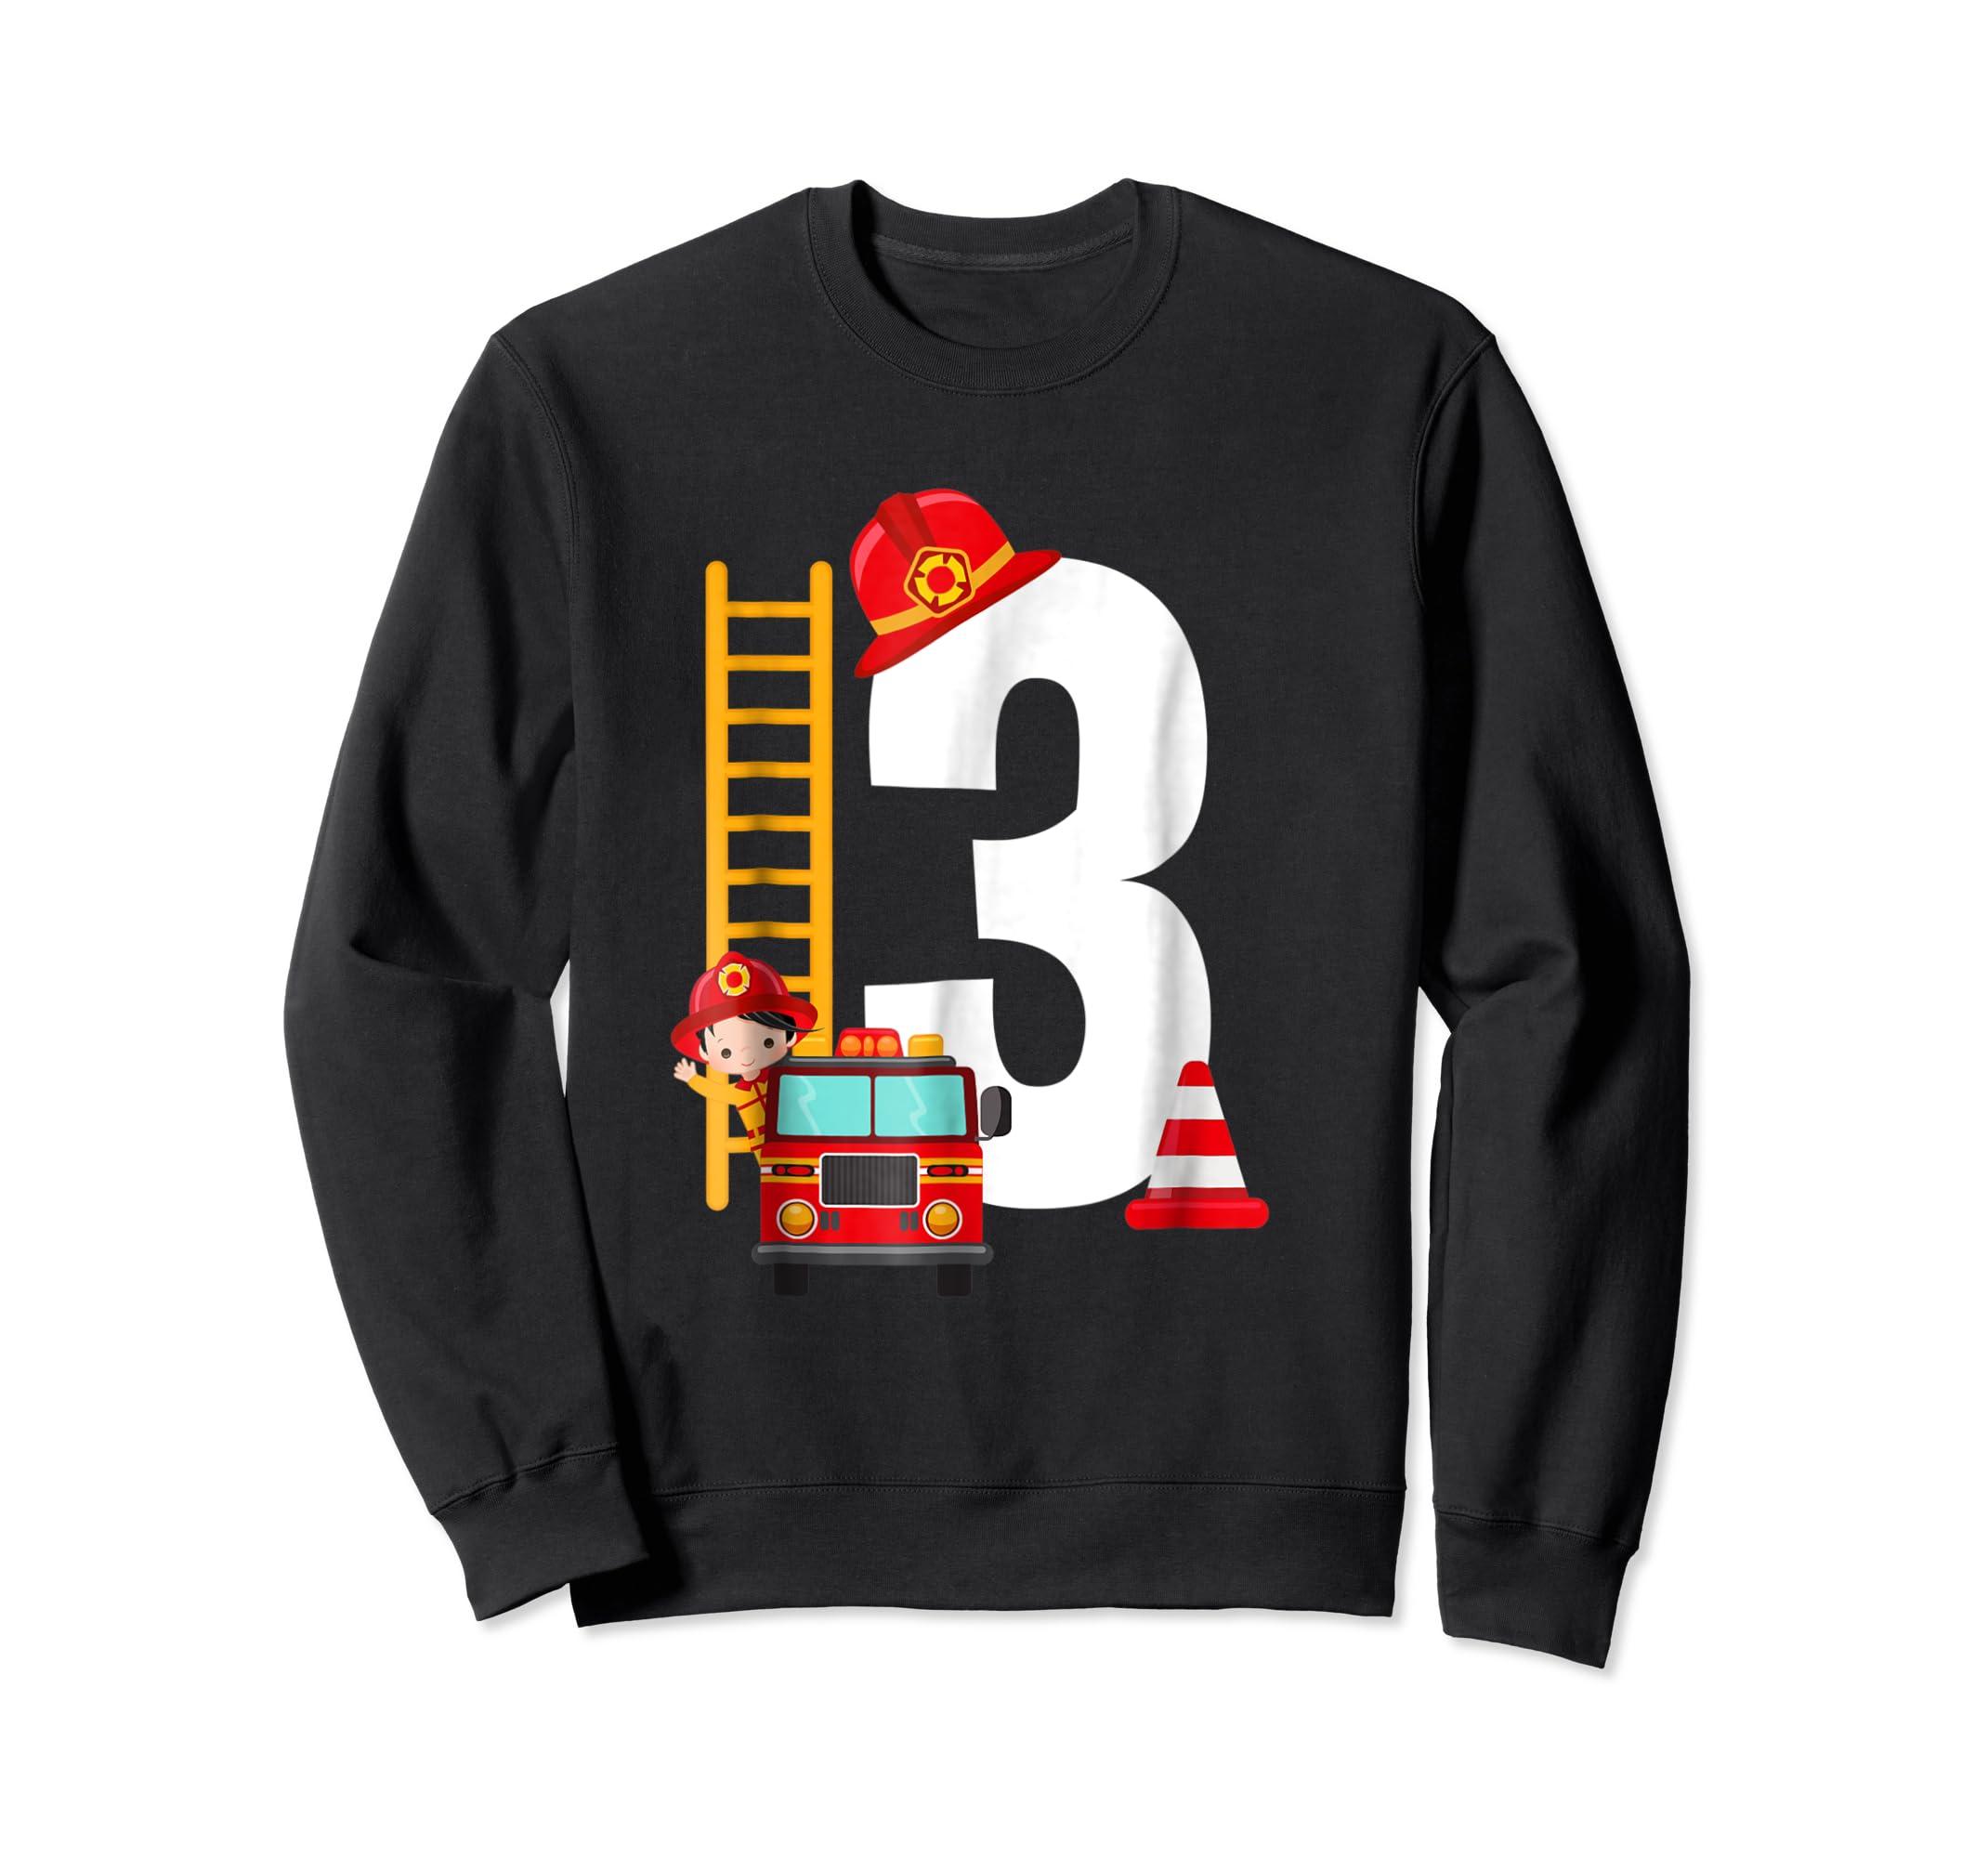 Kids 3rd Birthday Party Fire Truck Toddler T Shirt-Sweatshirt-Black